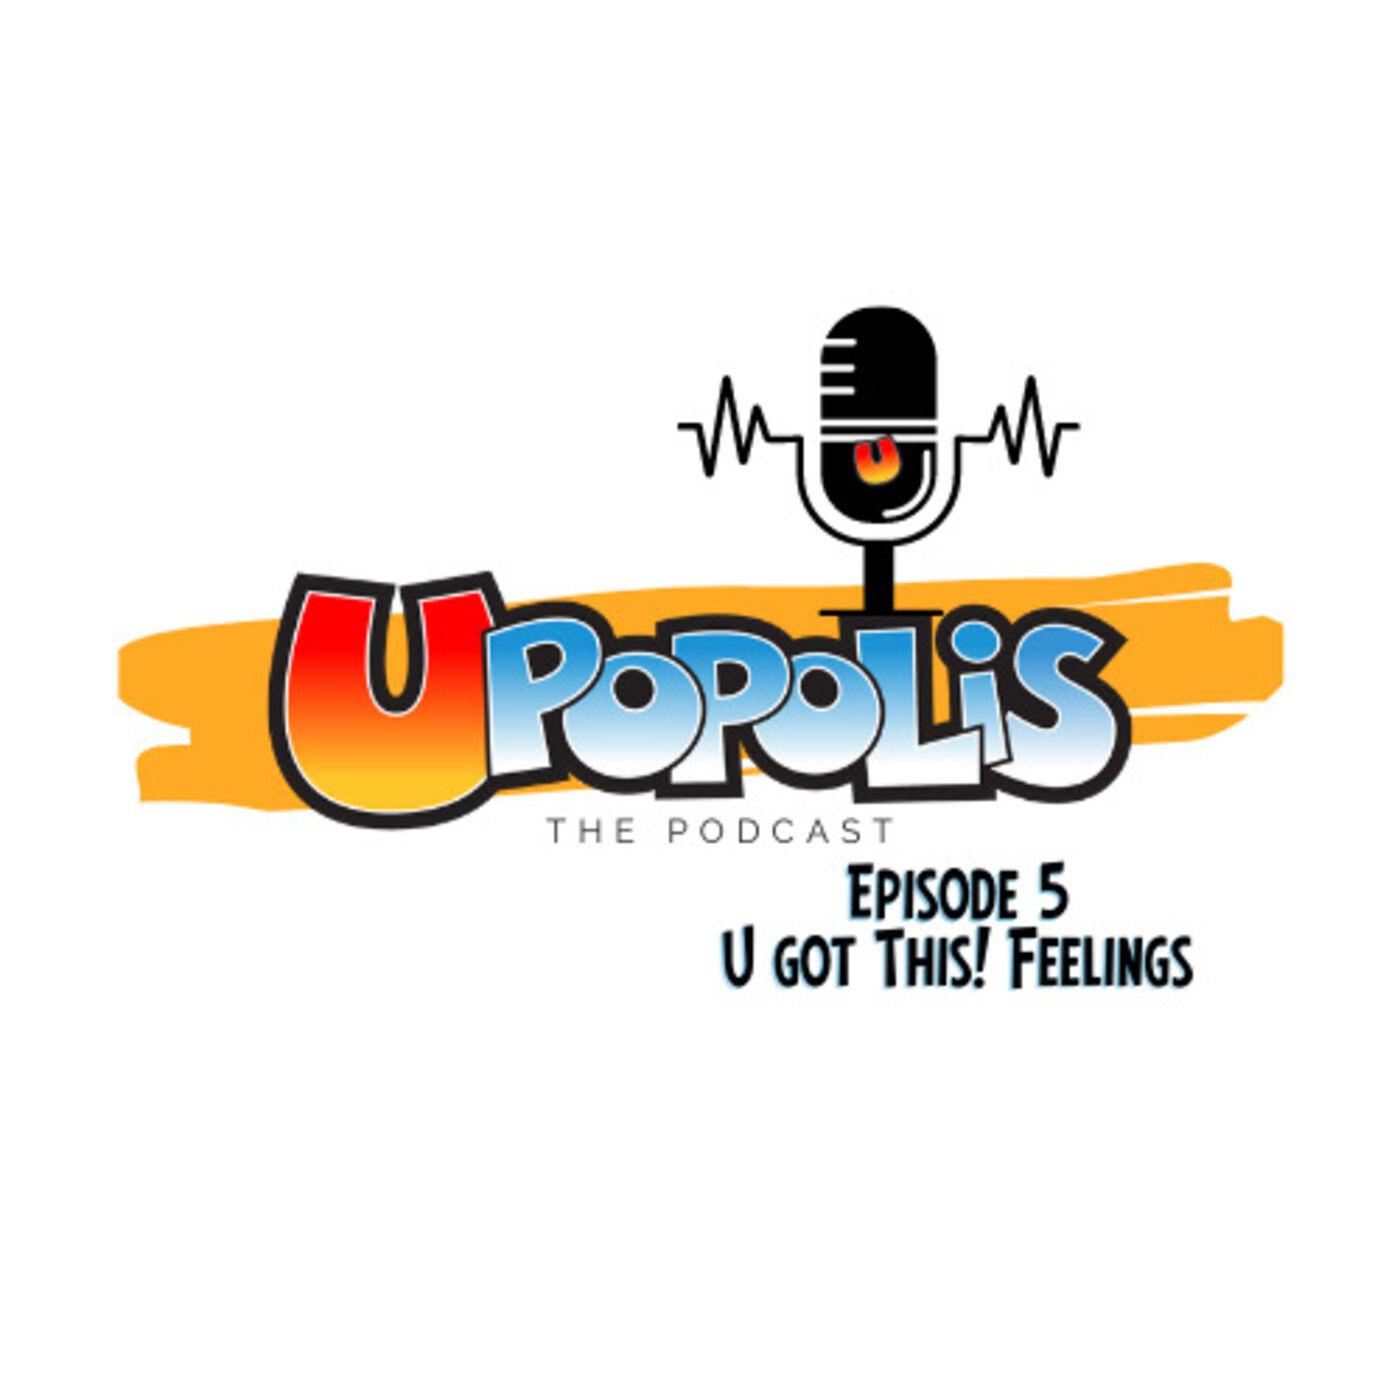 Episode 5: U Got This! Feelings